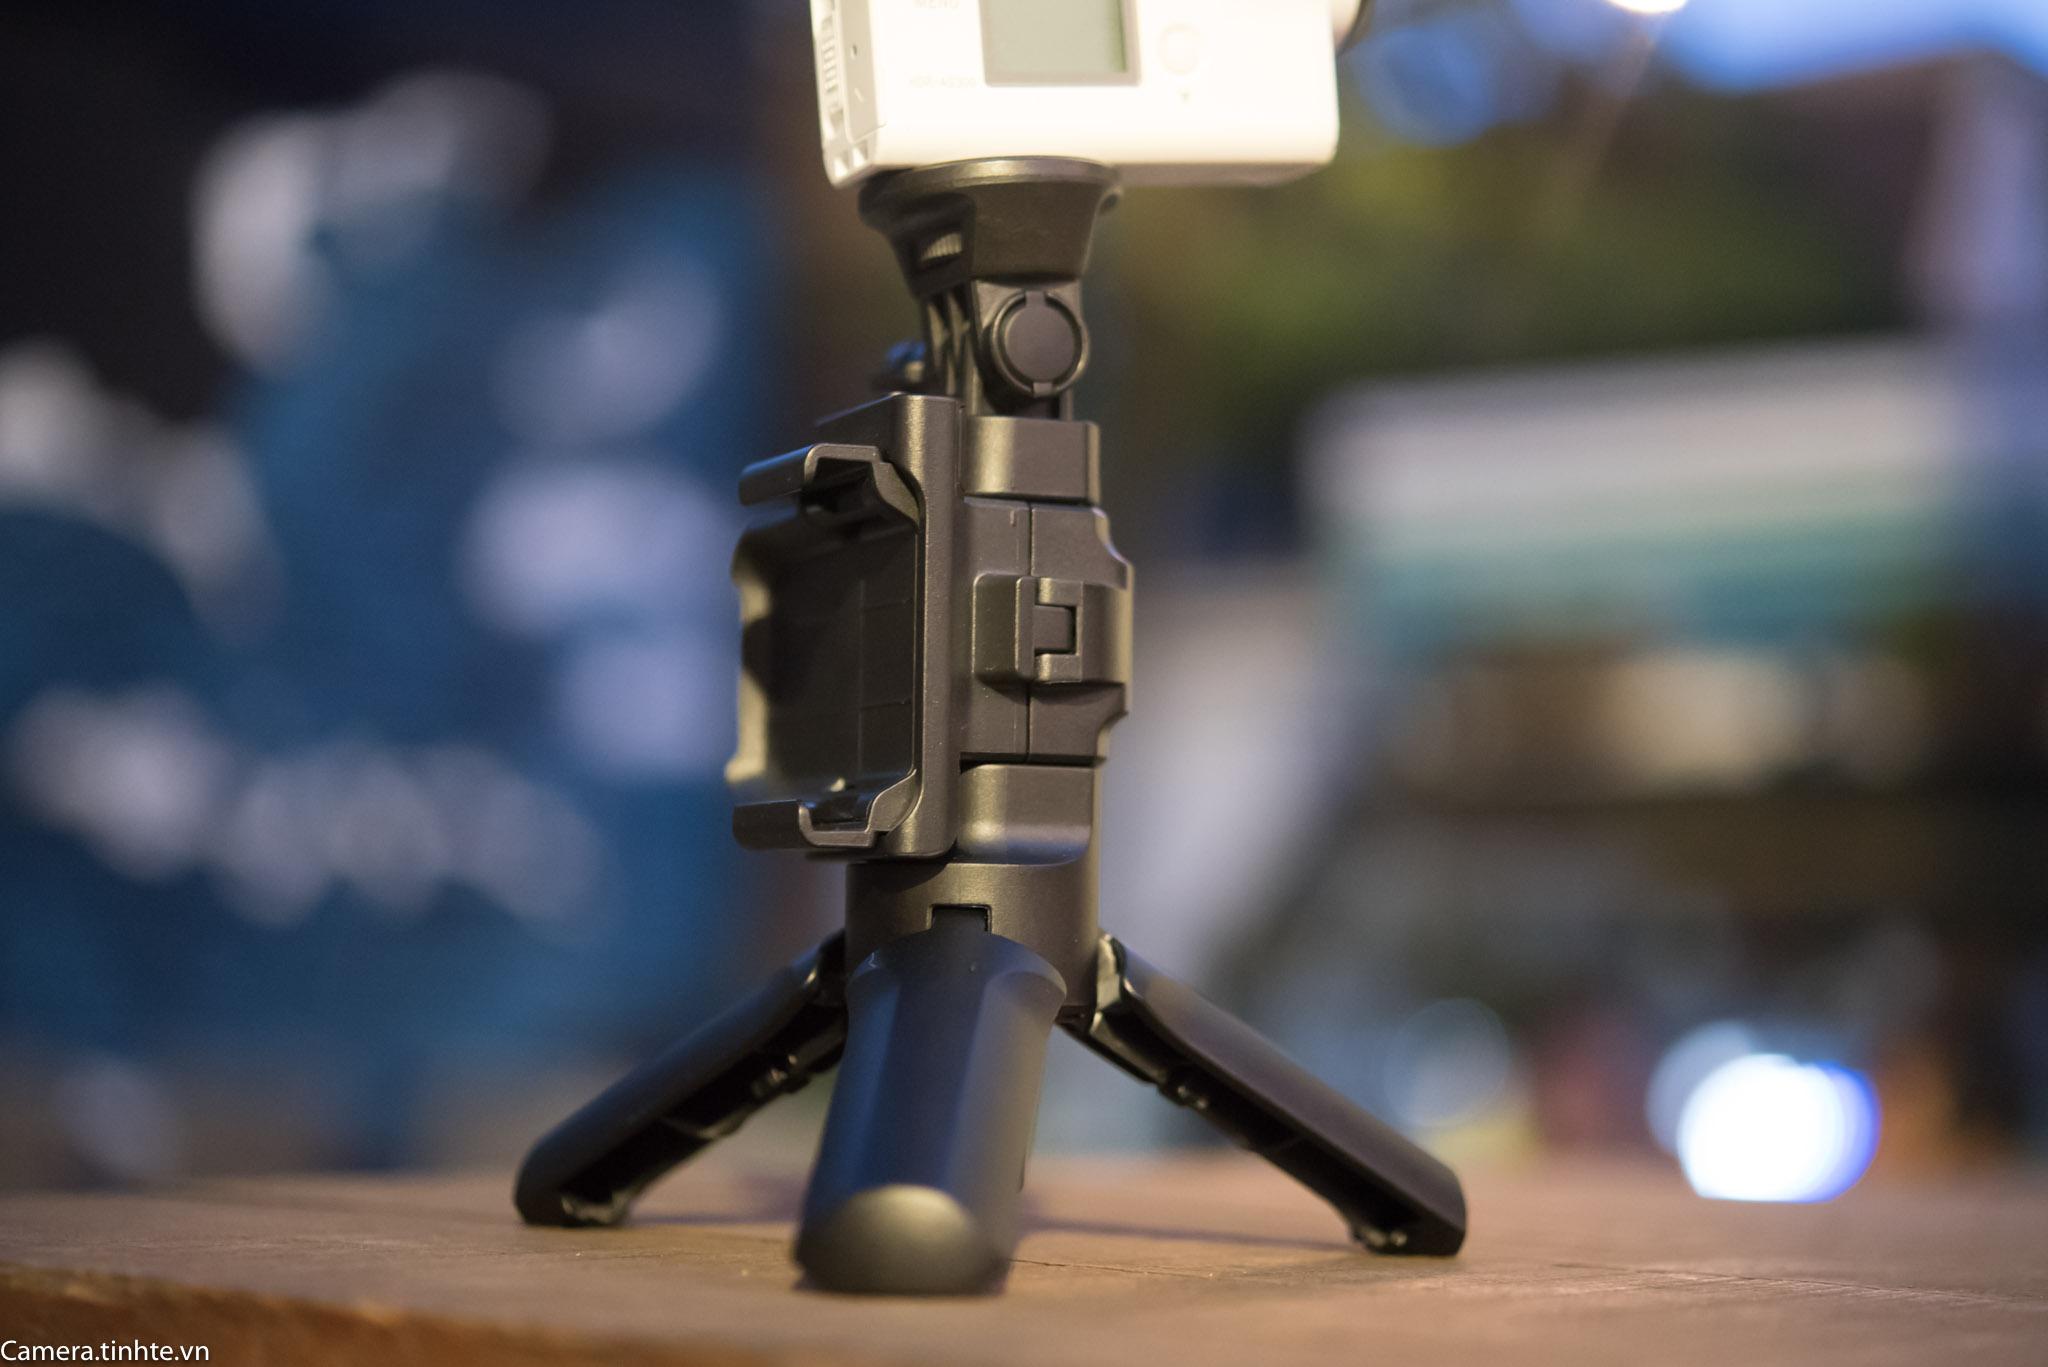 Phu kien Sony FDR-X3000 - Camera.tinhte.vn -14.jpg